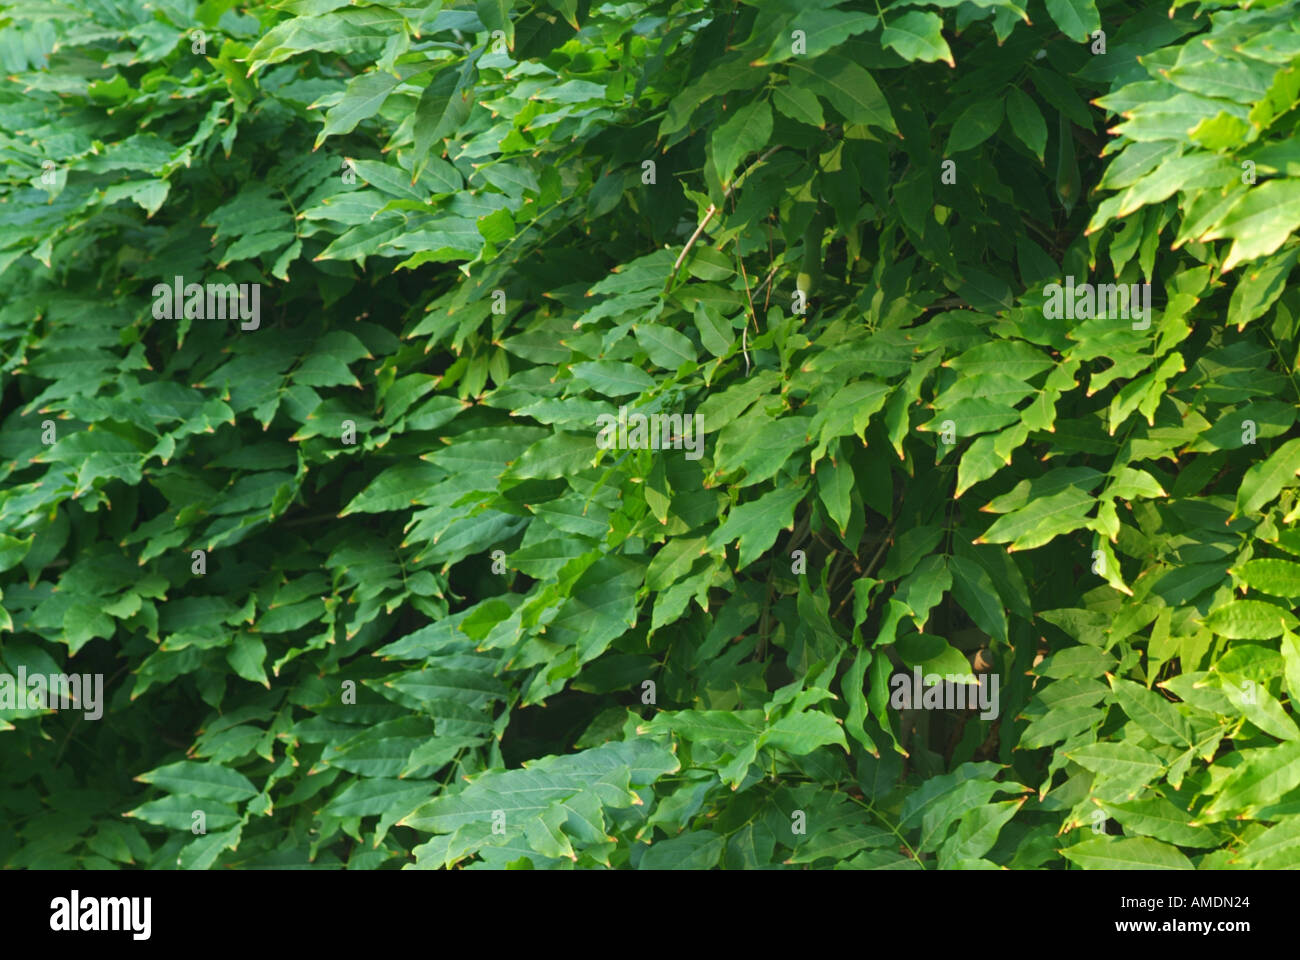 Wisteria Vine Leaves Stock Photo 4972835 Alamy